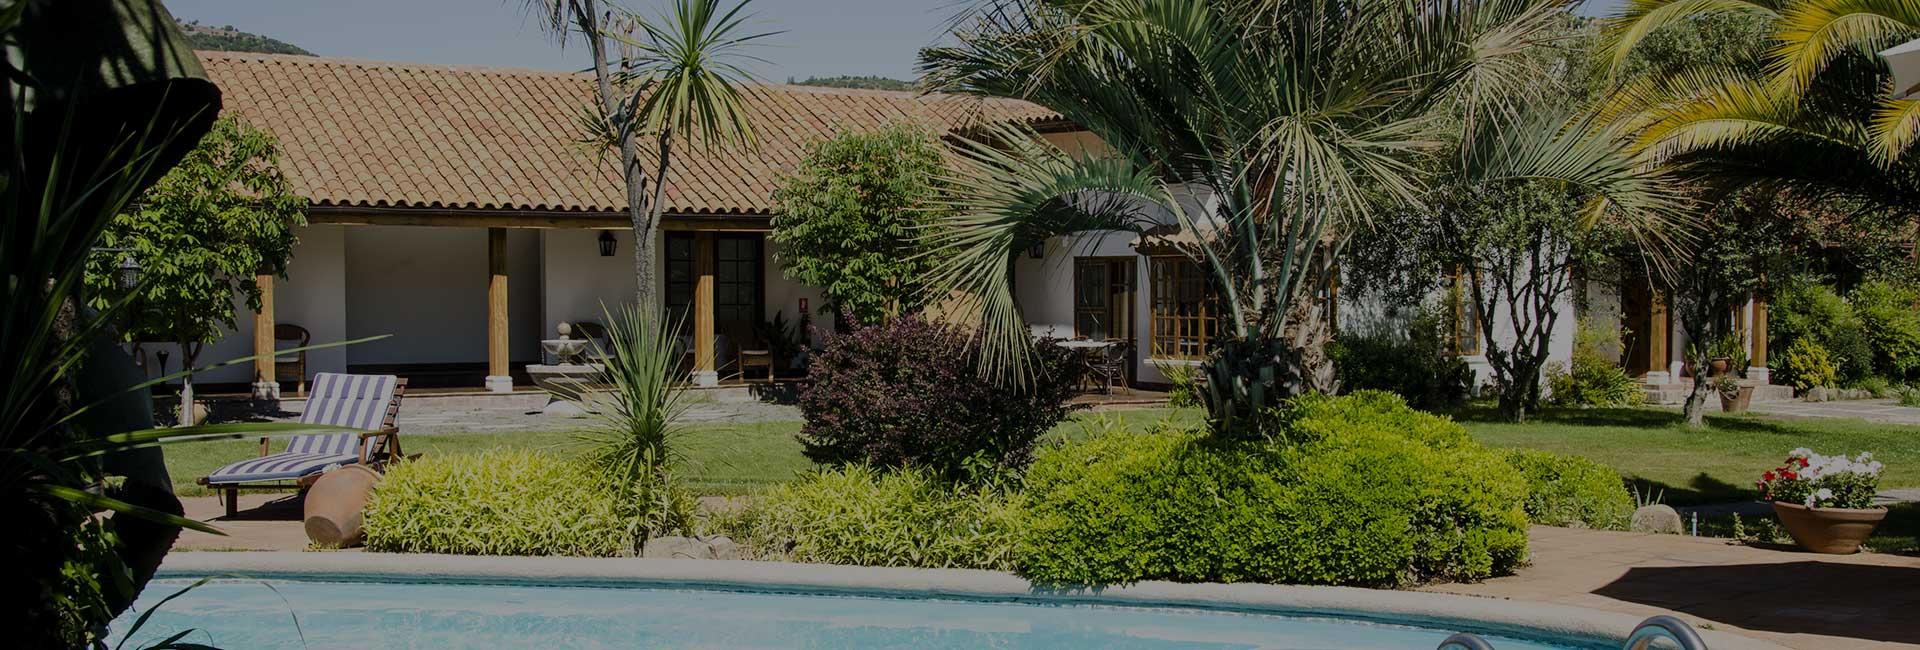 Hotel Solaz Bella Vista Colchagua palm trees